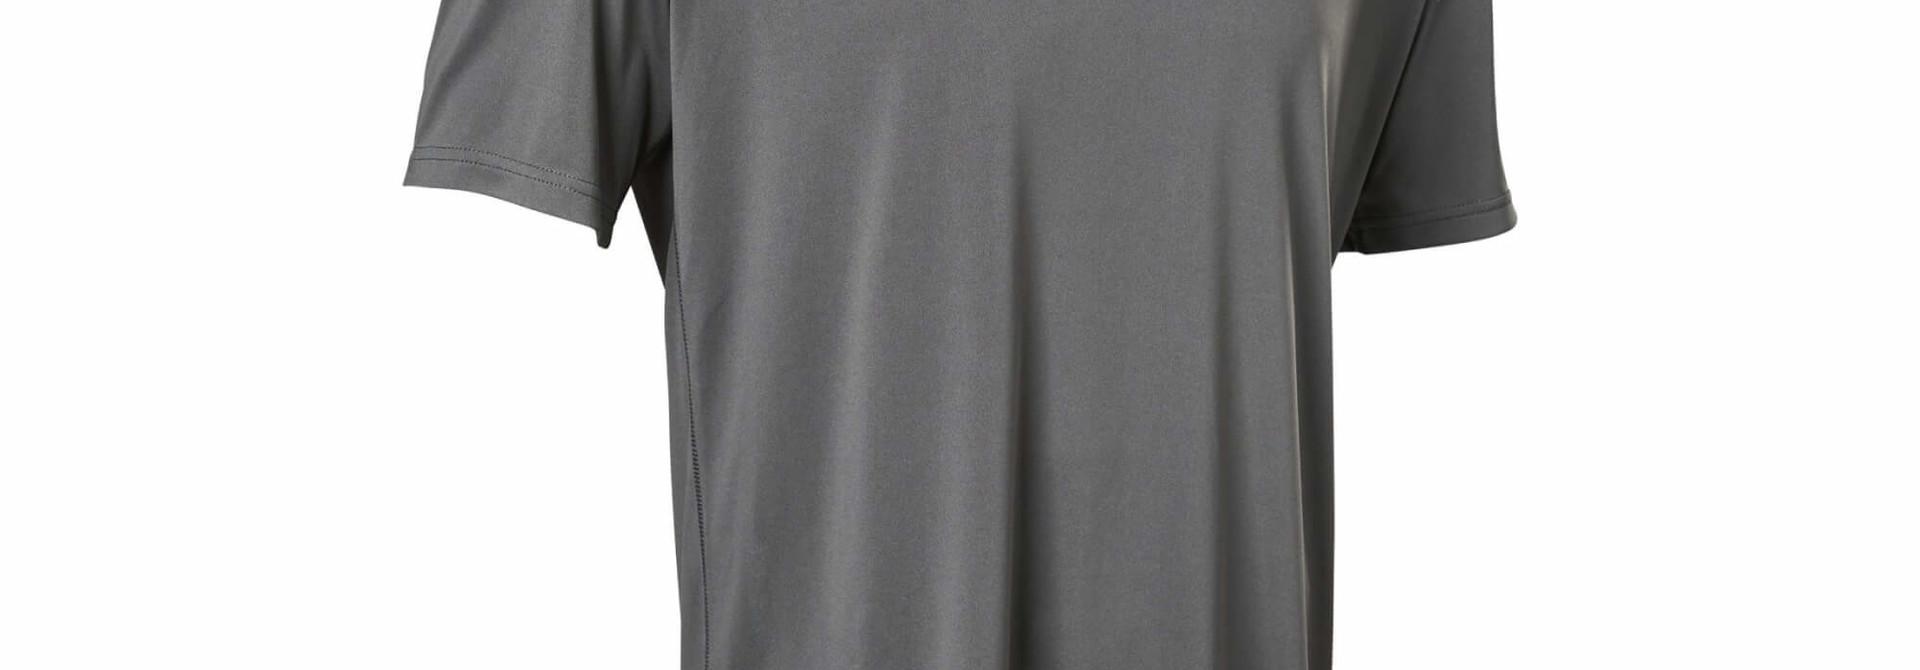 Ranger Short Sleeve Jersey Graphic 2 2021